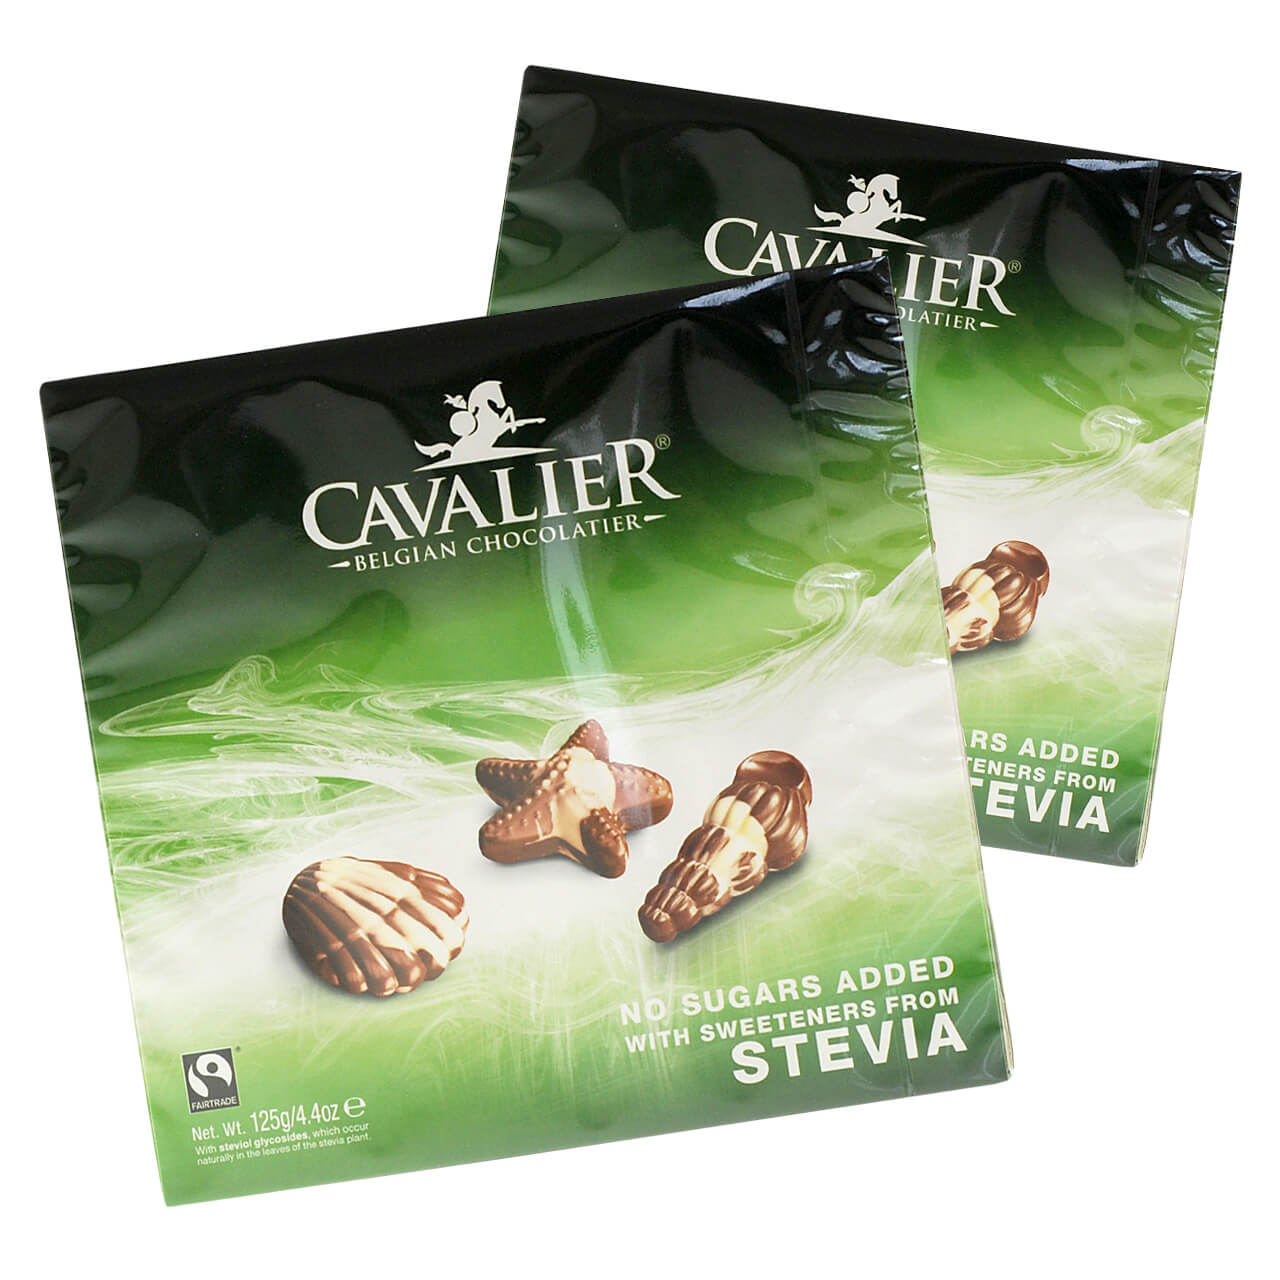 Cavalier Stevia Pralinen Nuss Nougat Meeresfrüchte, Cavalier Stevia Pralinen kaufen, Cavalier Stevia bestellen